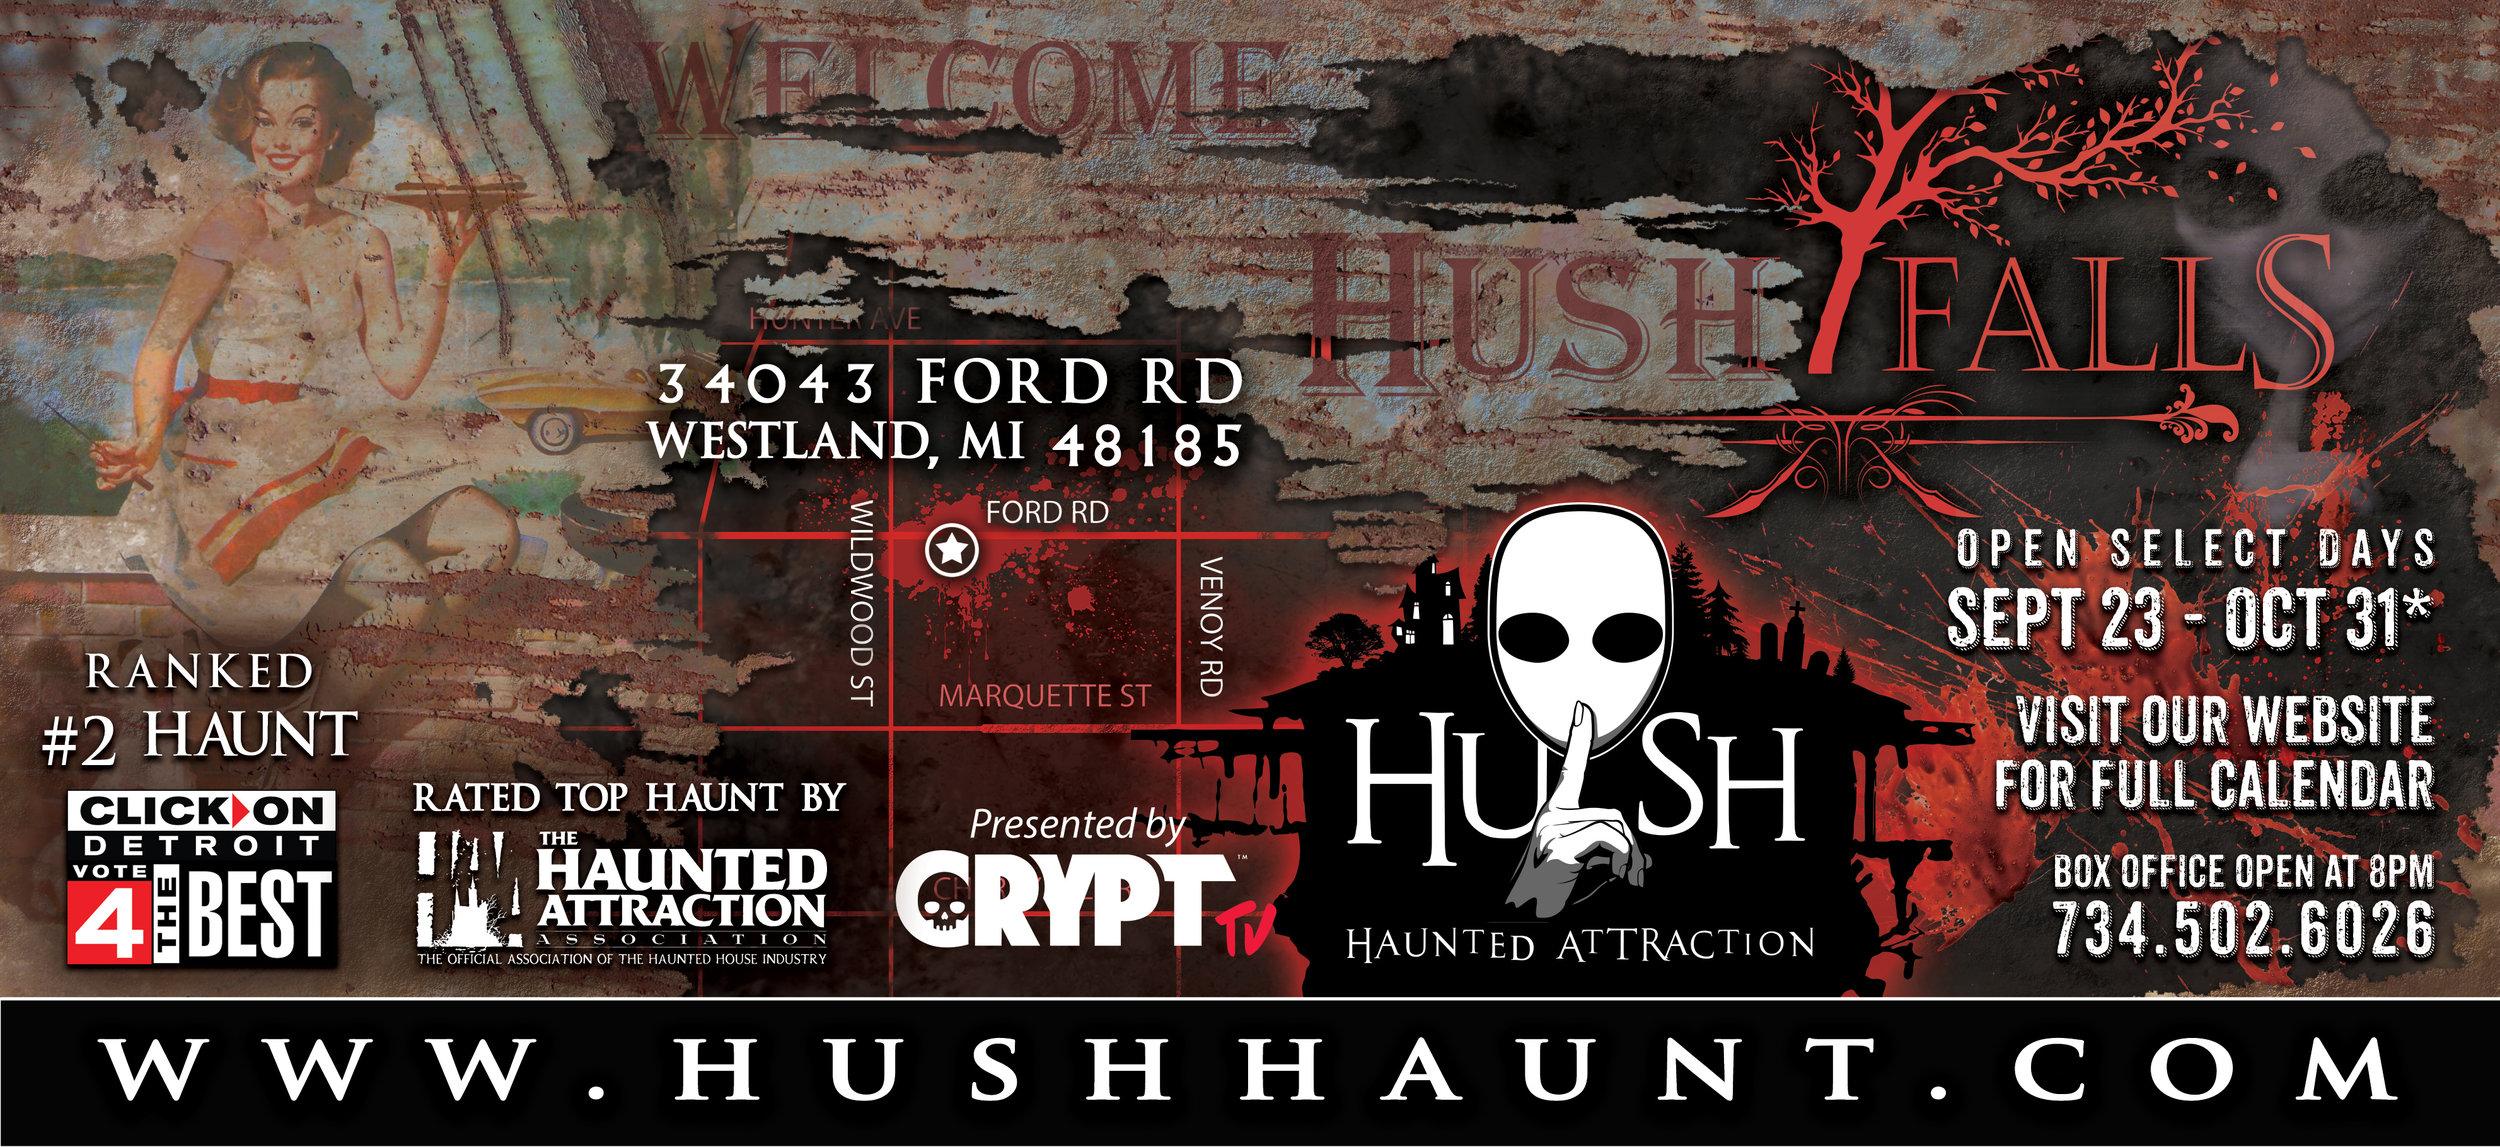 HUSH Haunted Attraction Billboard 1